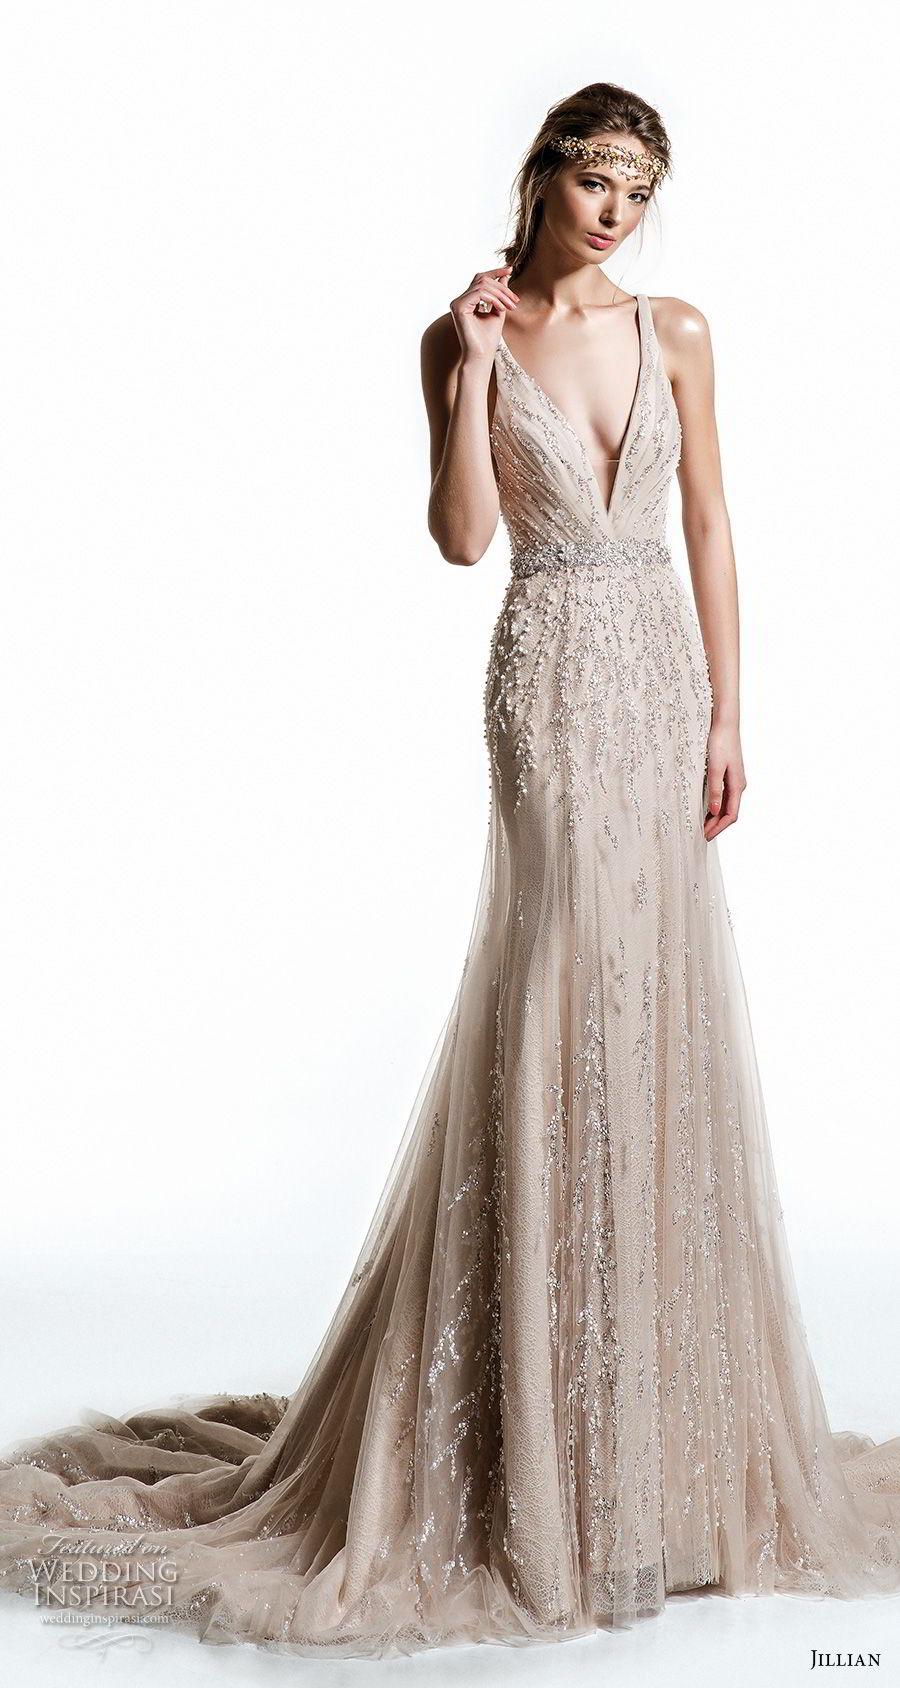 jillian 2019 bridal sleeveless with strap deep v neck full embellishment elegant glitzy champagne modified a  line wedding dress razor back medium train (14) mv